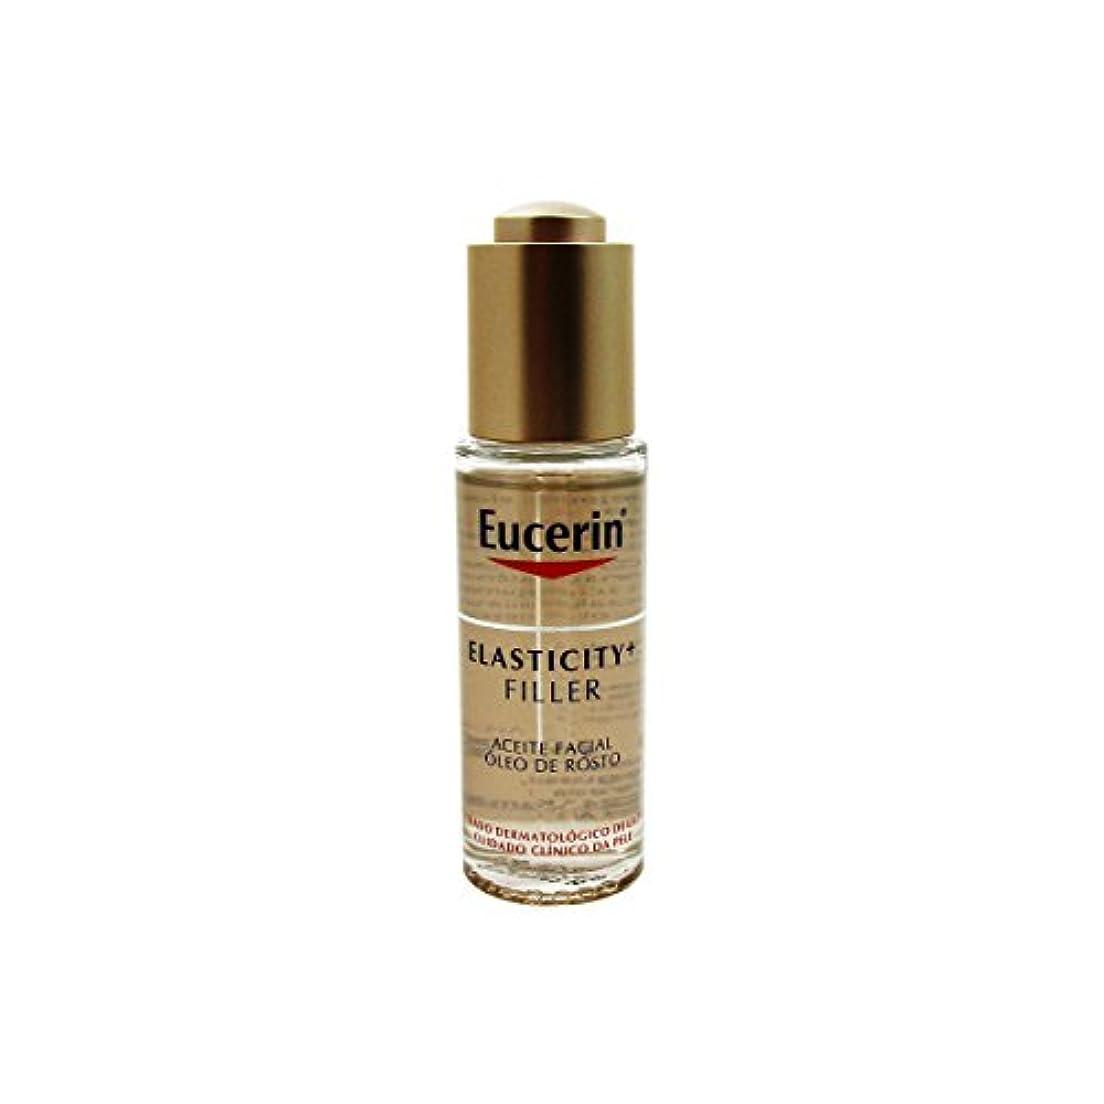 認証路面電車貝殻Eucerin Elasticity Filler Facial Oil 30ml [並行輸入品]